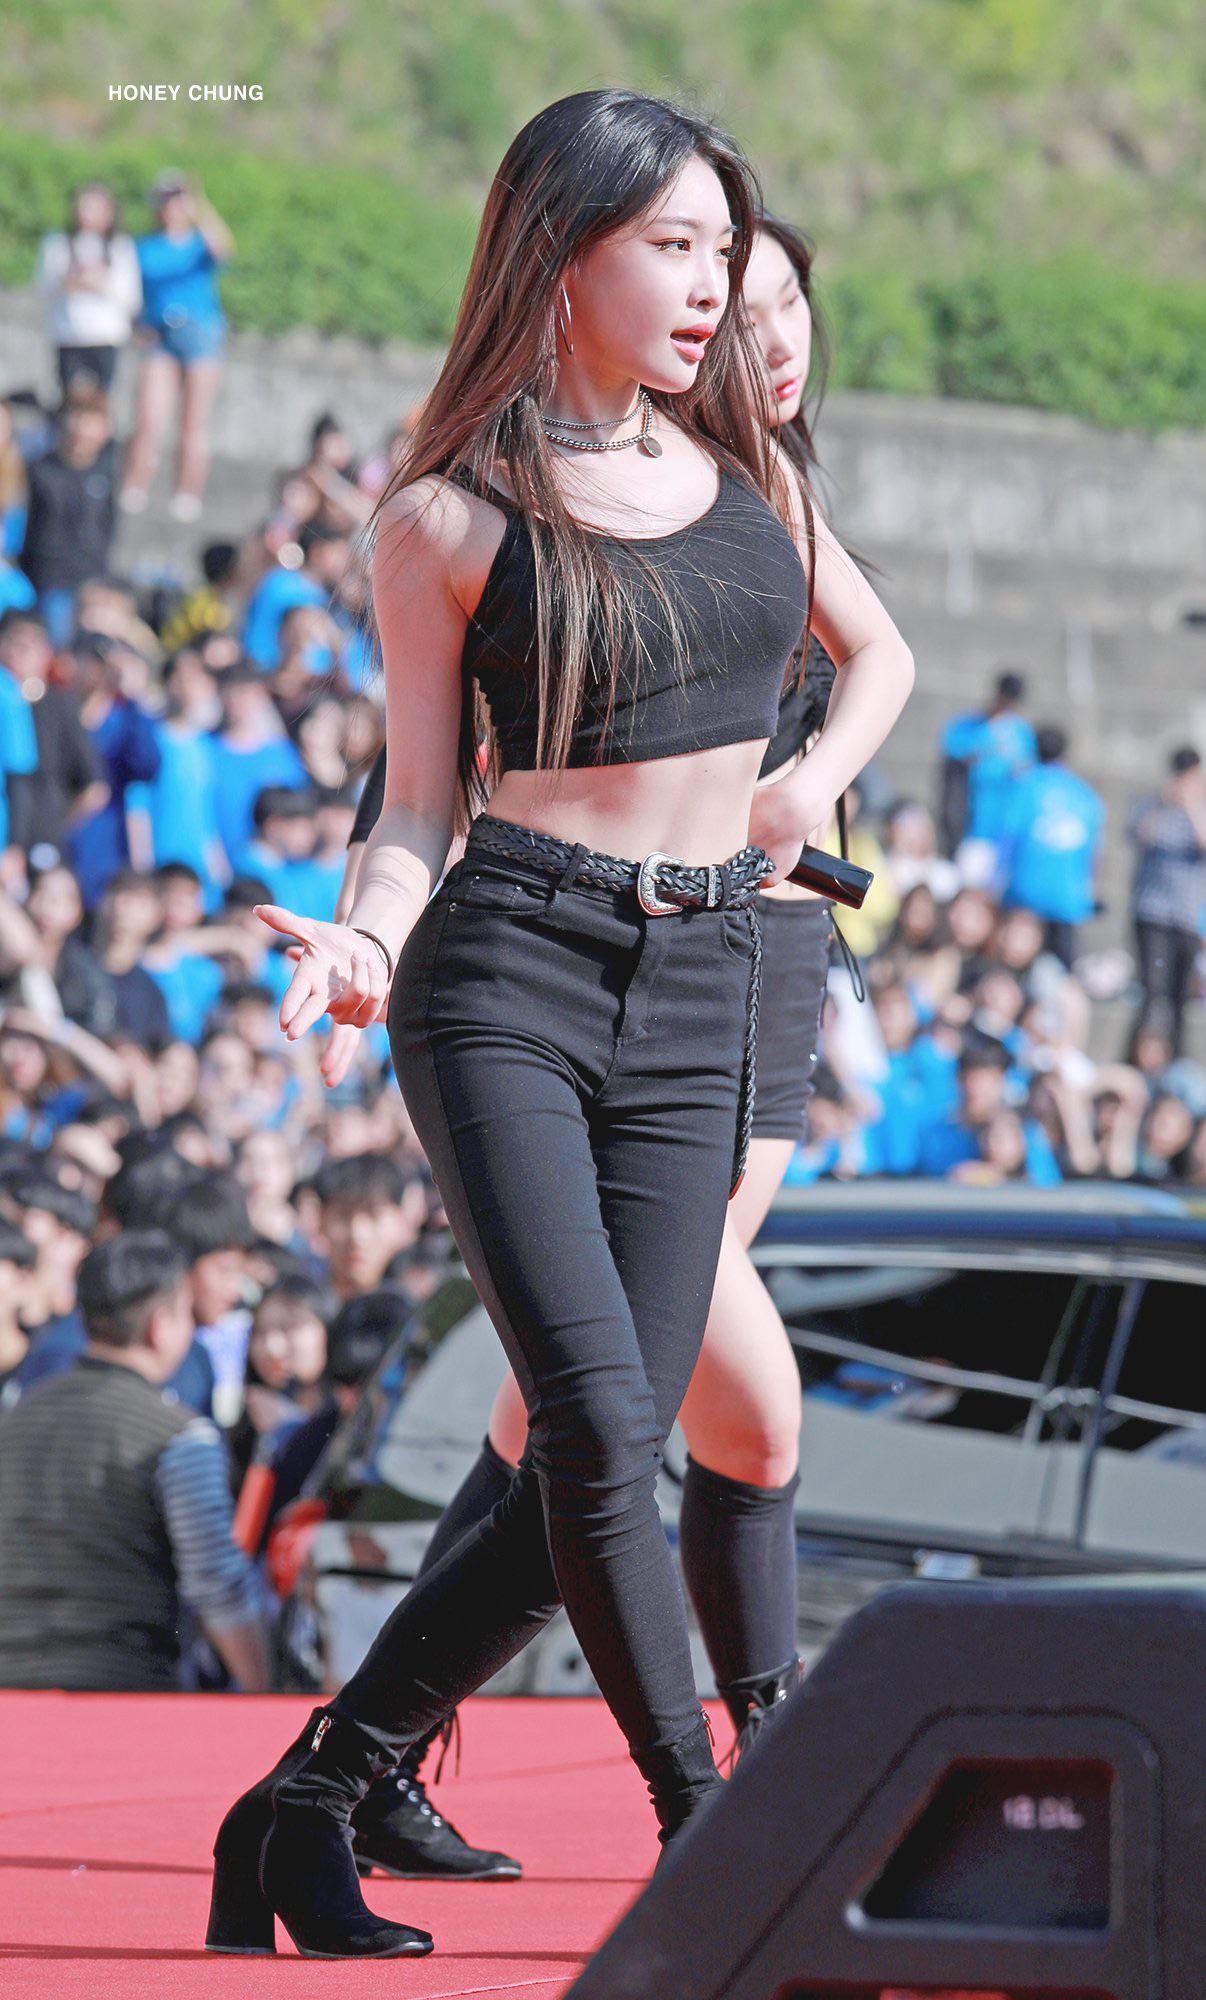 Kpop February 9